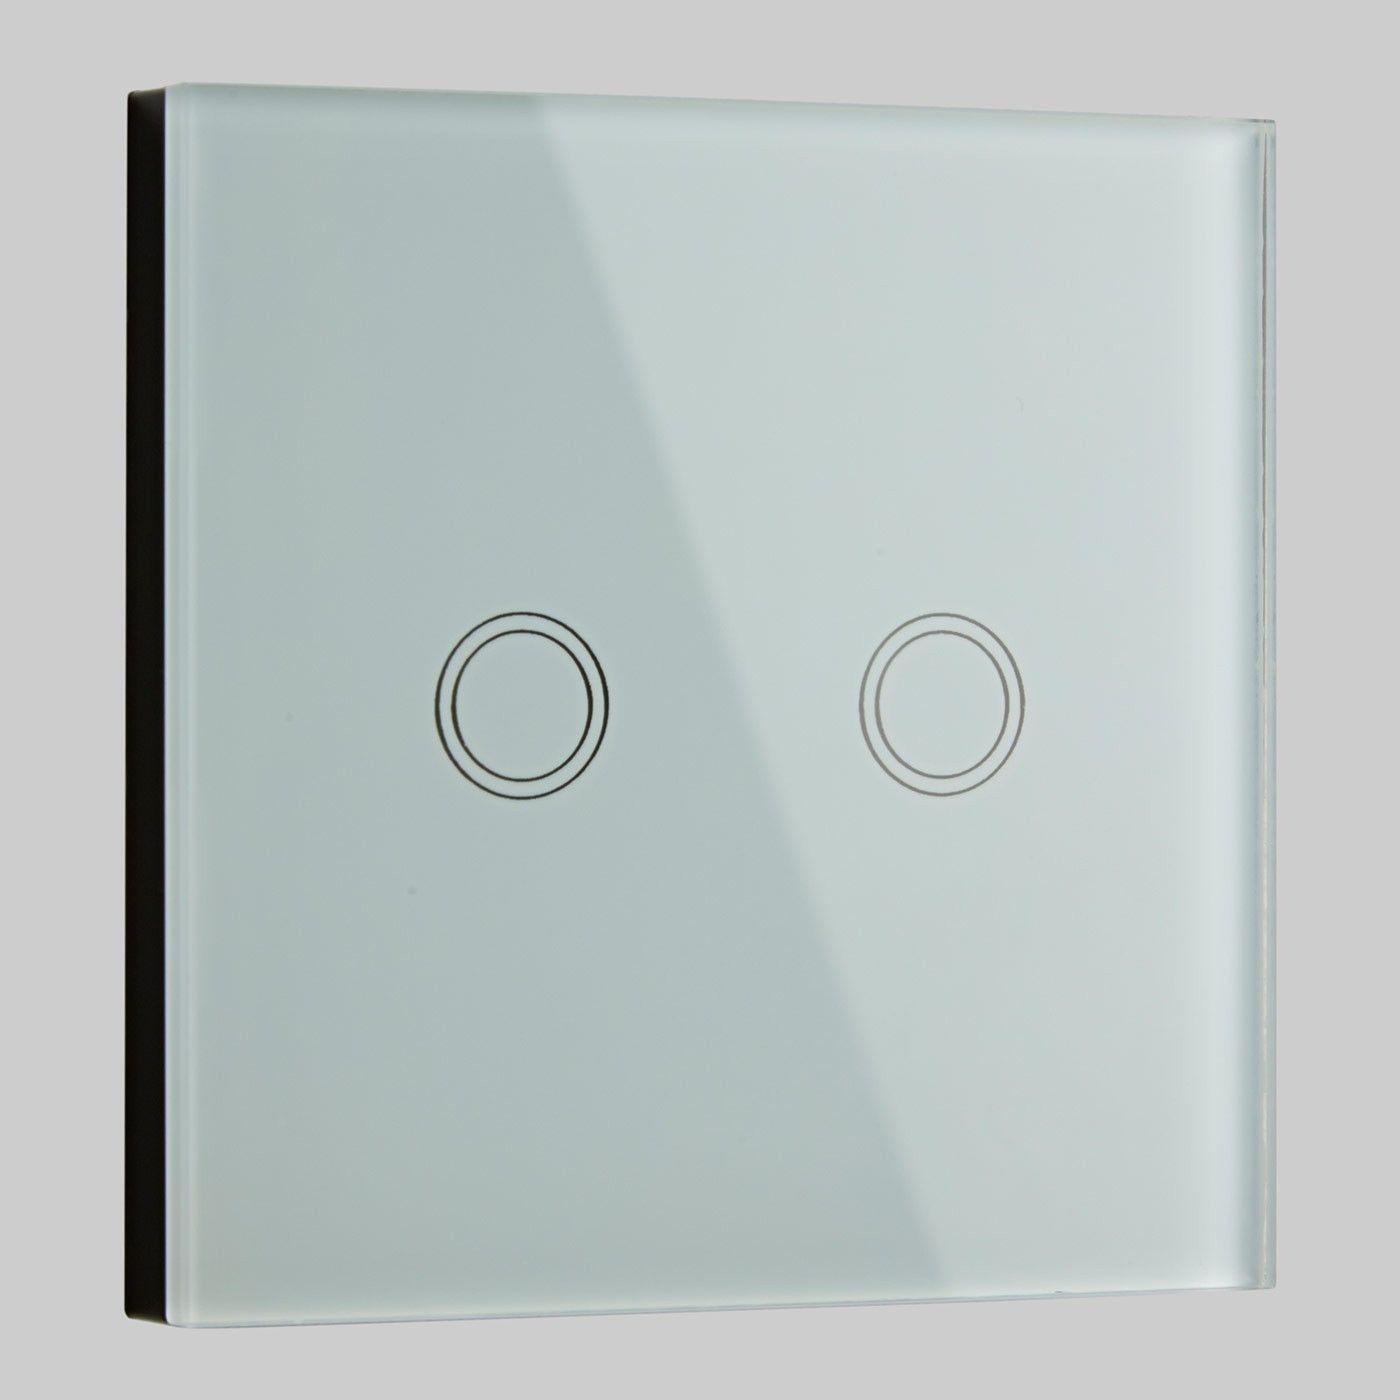 Biard 2 Gang White Glass Designer Touch Light Switch | Touch light ... for modern dimmer light switches  155fiz